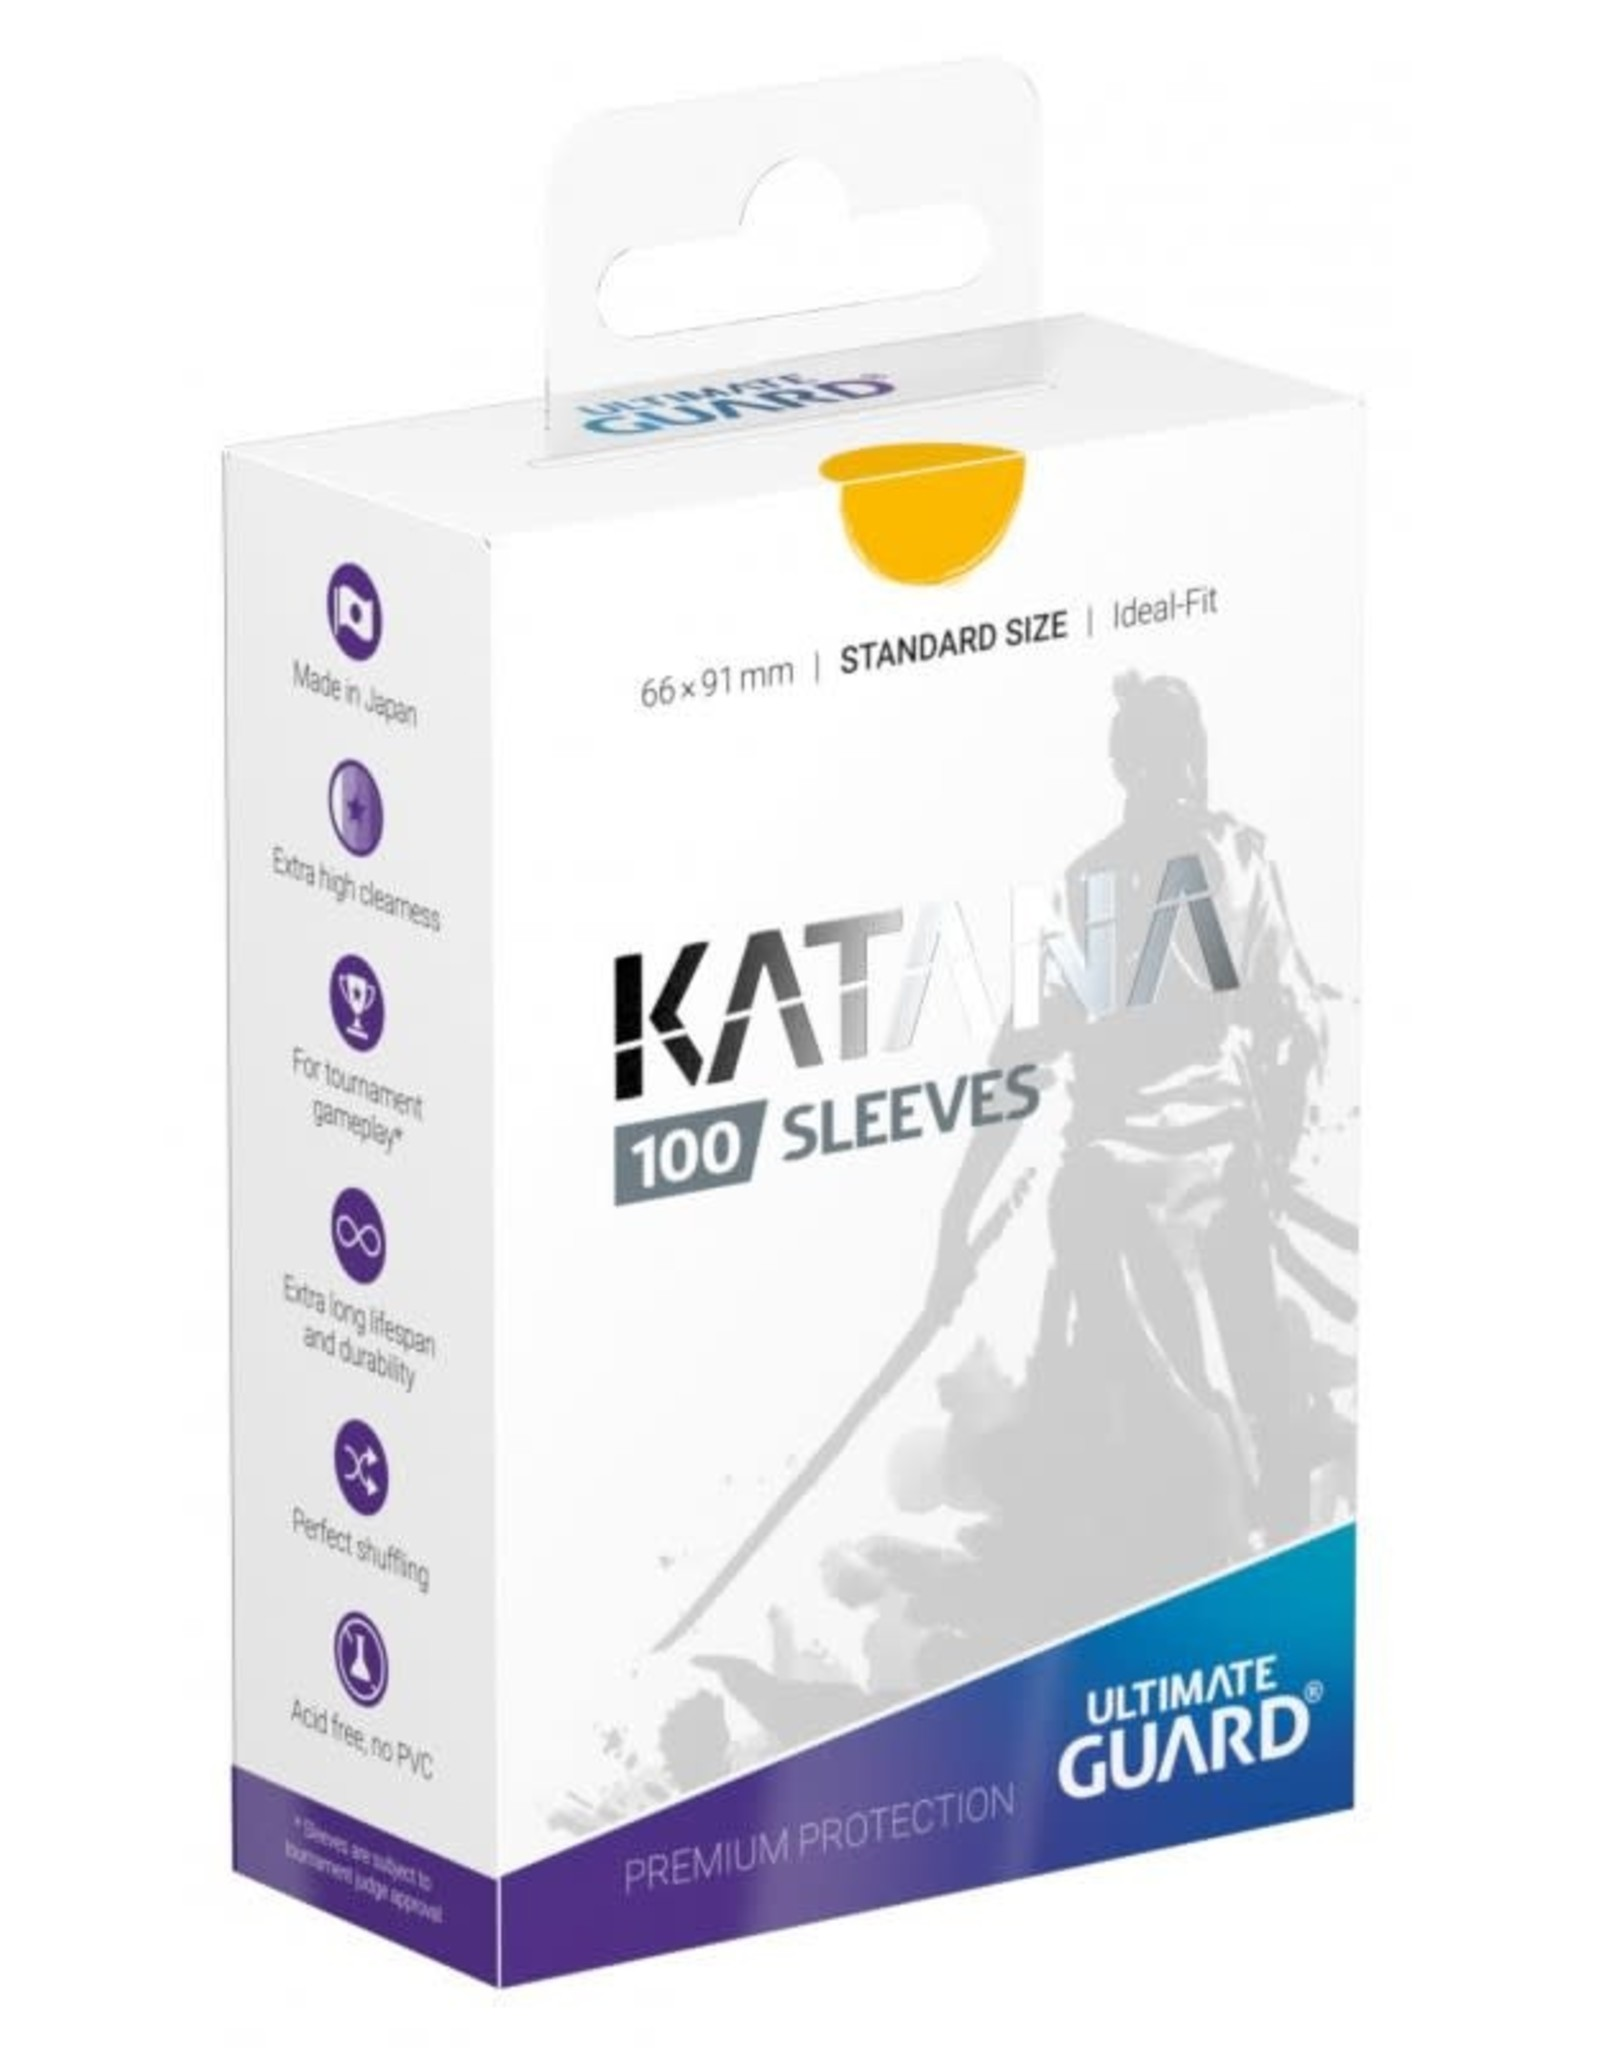 Ultimate Guard Katana Sleeves 100 Yellow